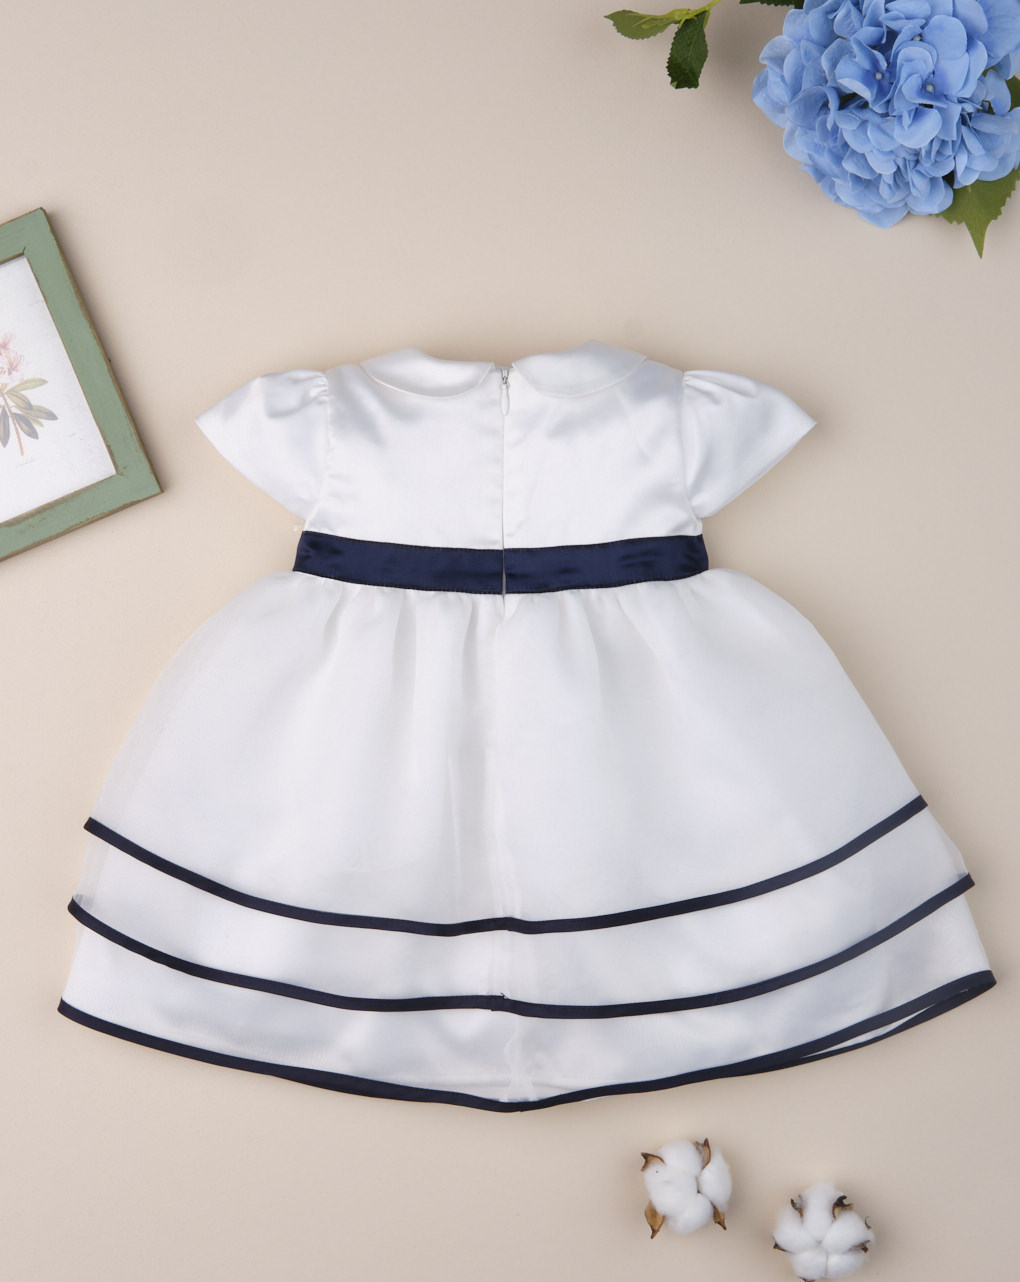 "Abito da cerimonia bimba ""blue & white"" - Prénatal"